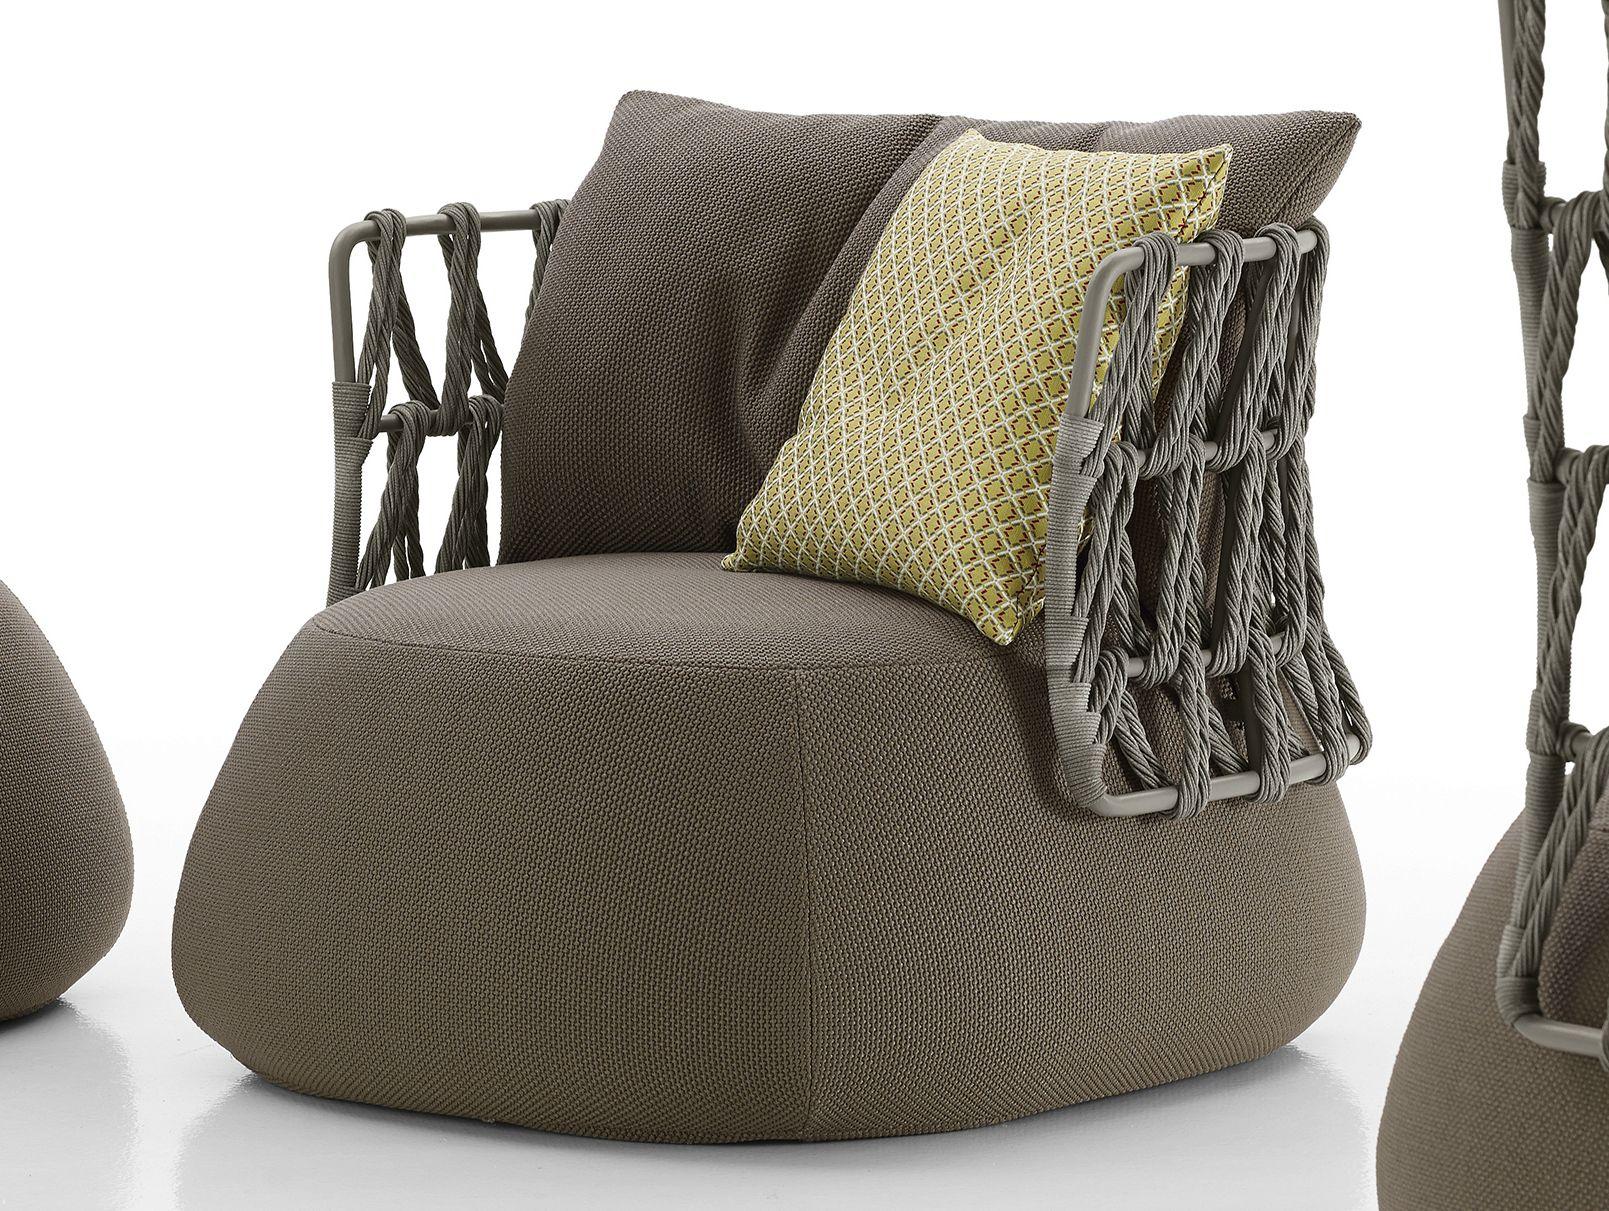 fat sofa outdoor poltrona da giardino by b b italia. Black Bedroom Furniture Sets. Home Design Ideas